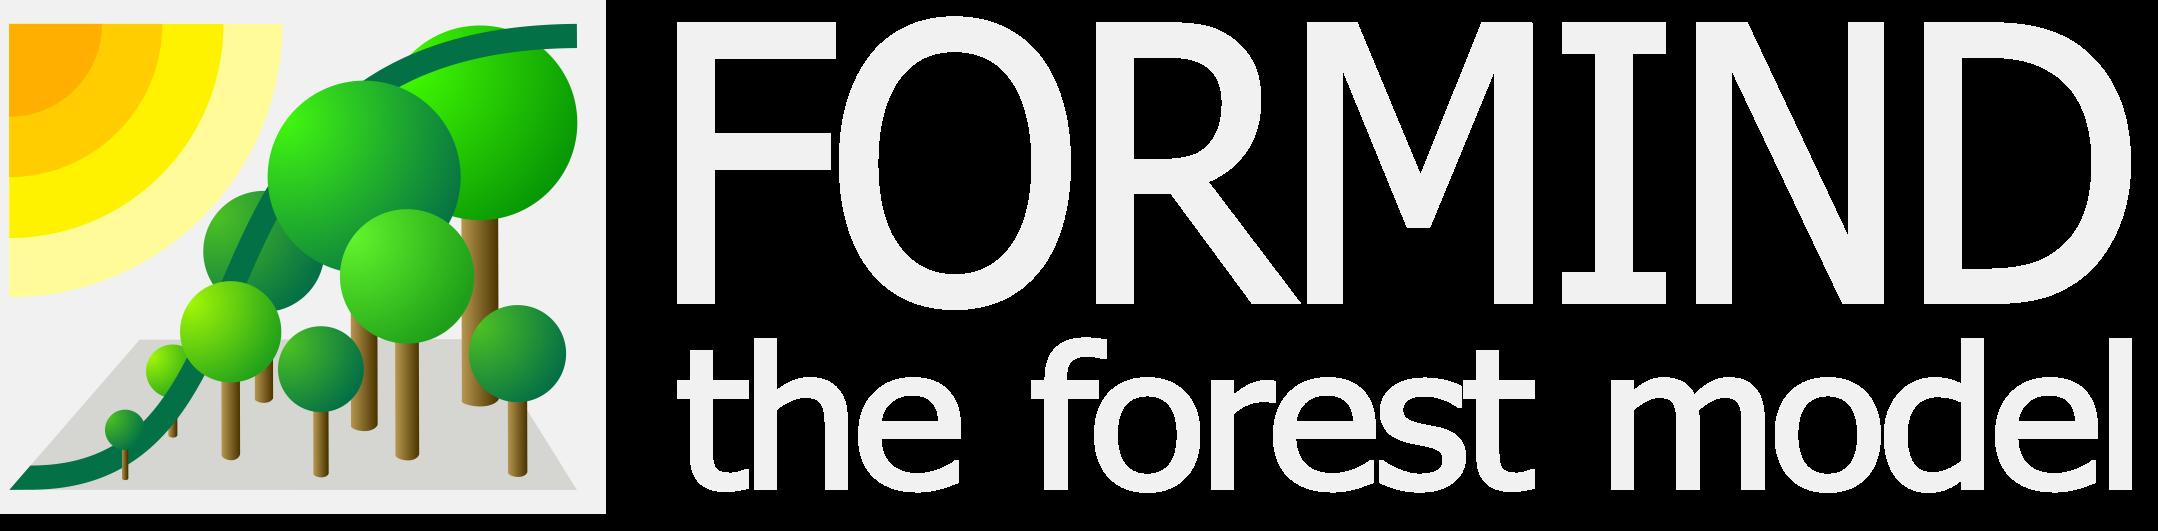 FORMIND